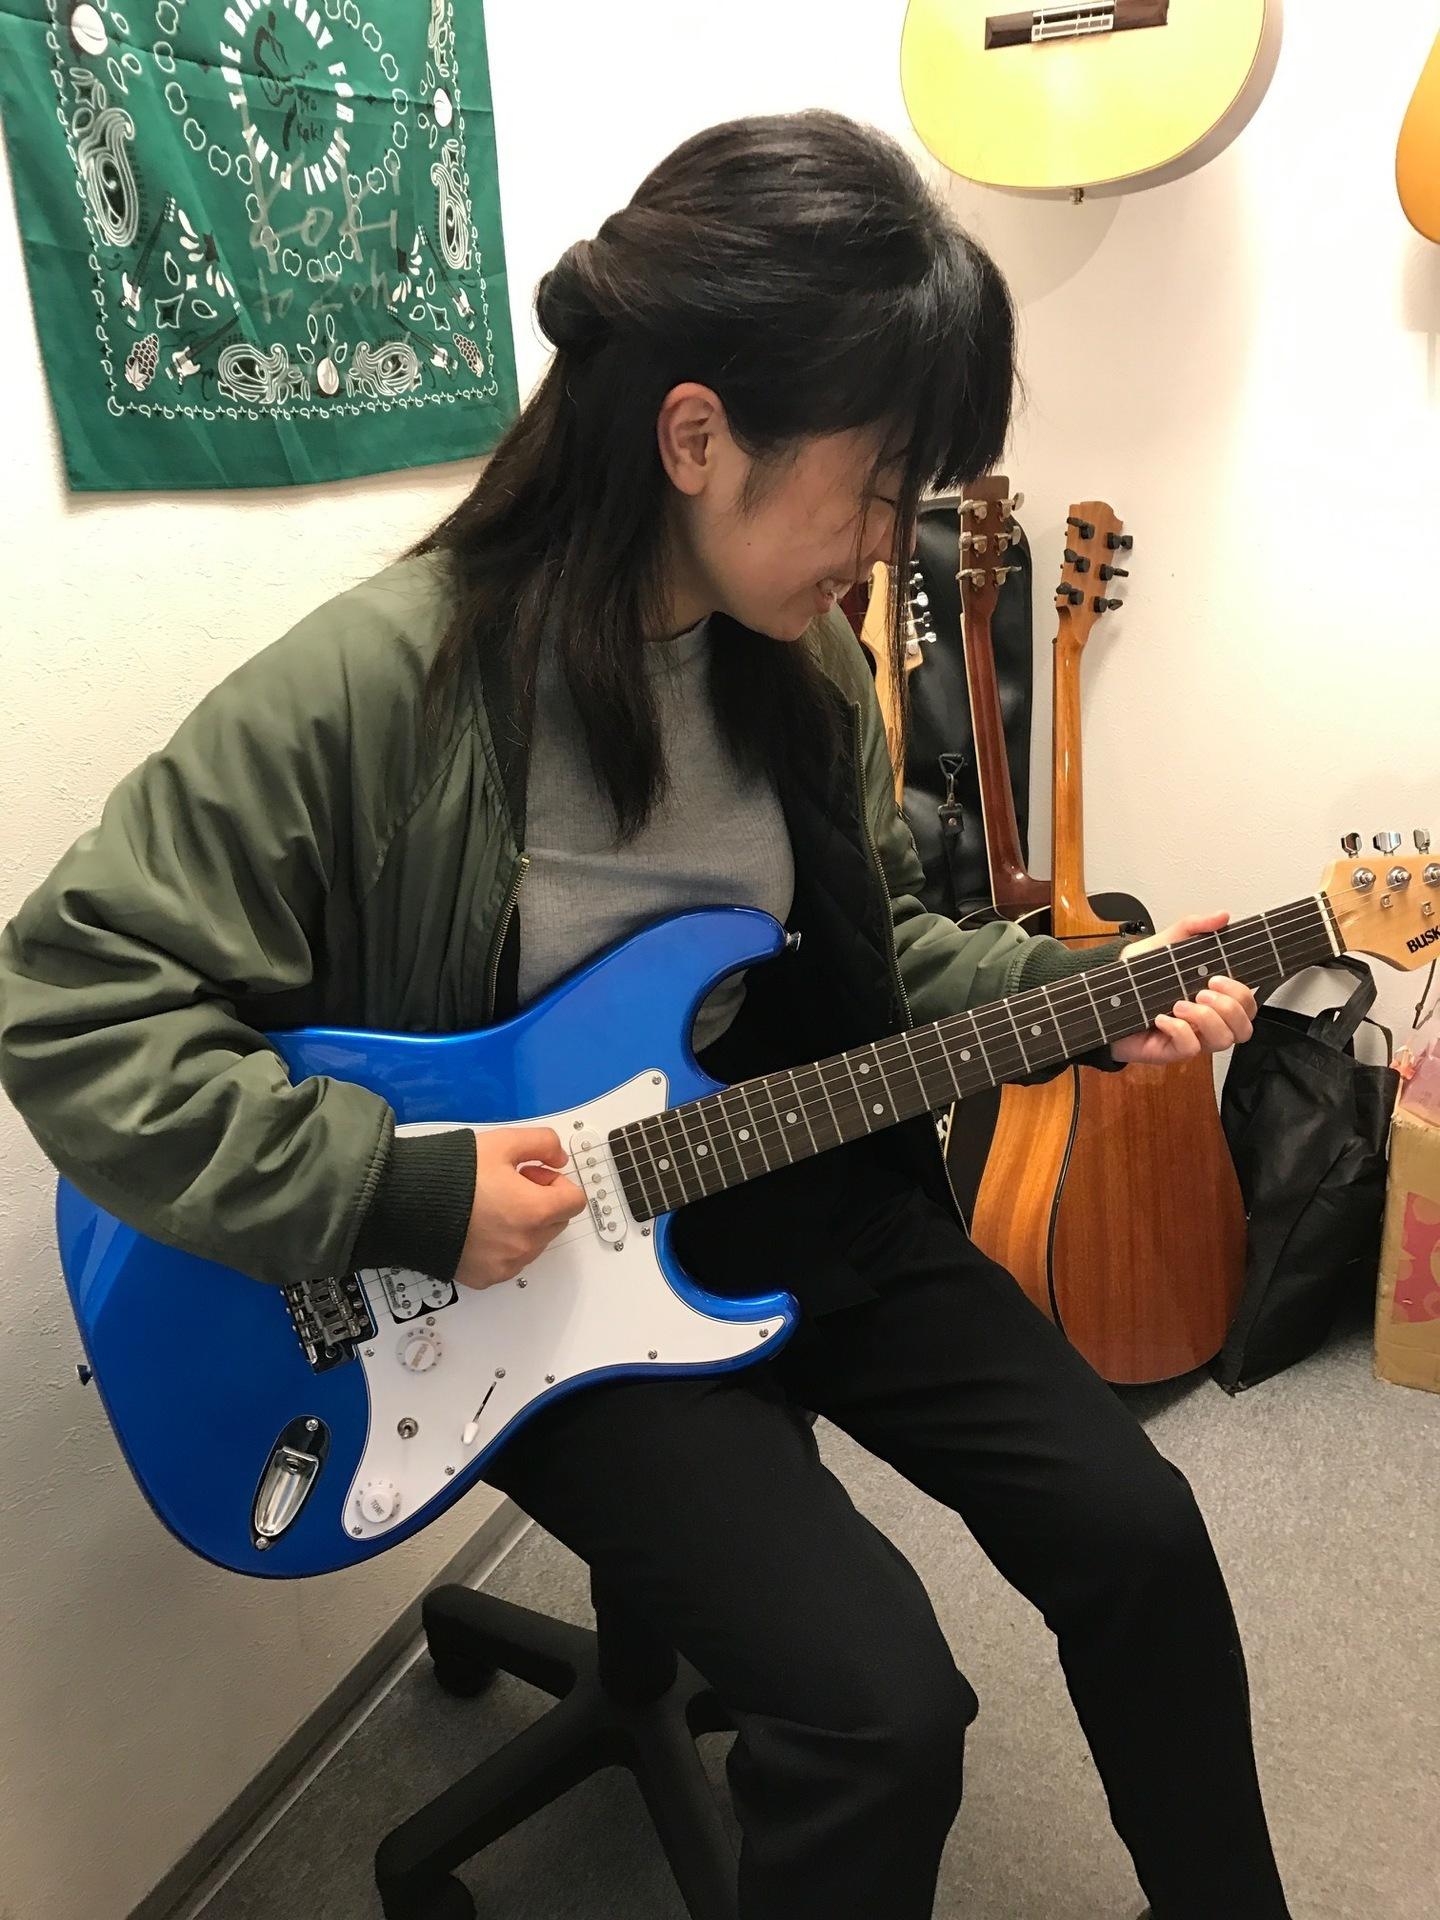 FIT'S MUSIC SCHOOL(フィッツ ミュージック スクール)